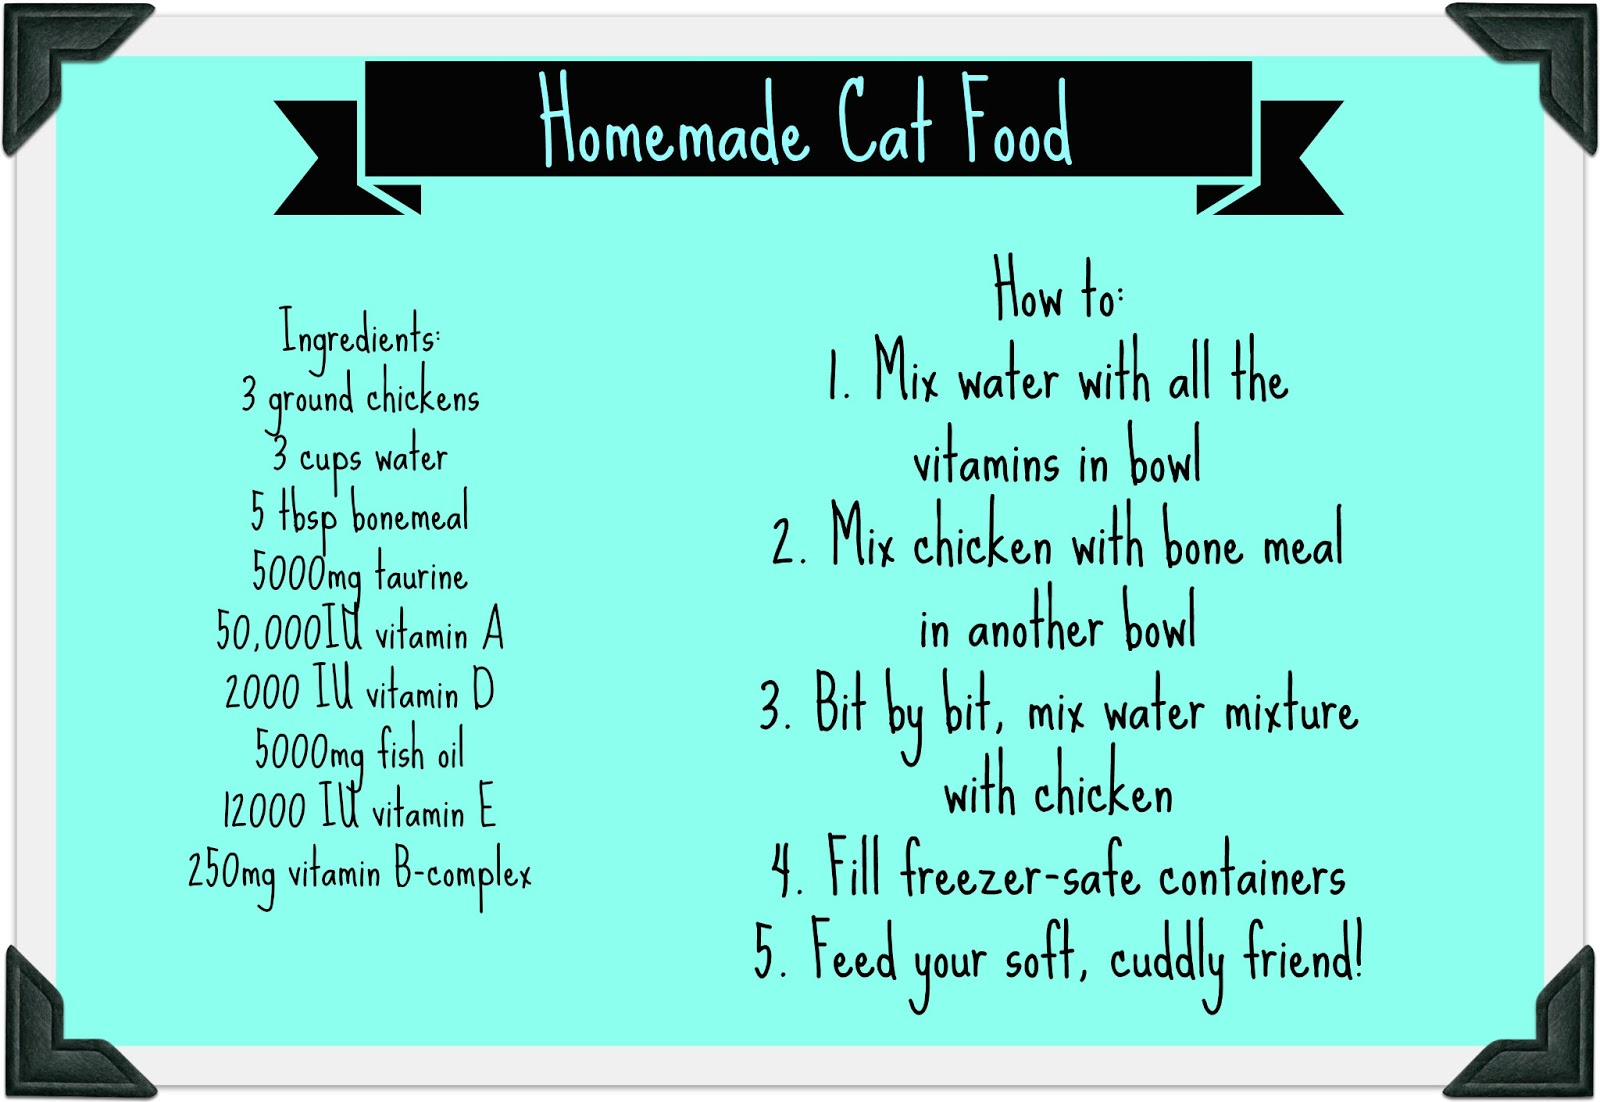 Food recipe homemade cat food recipe images of homemade cat food recipe forumfinder Choice Image